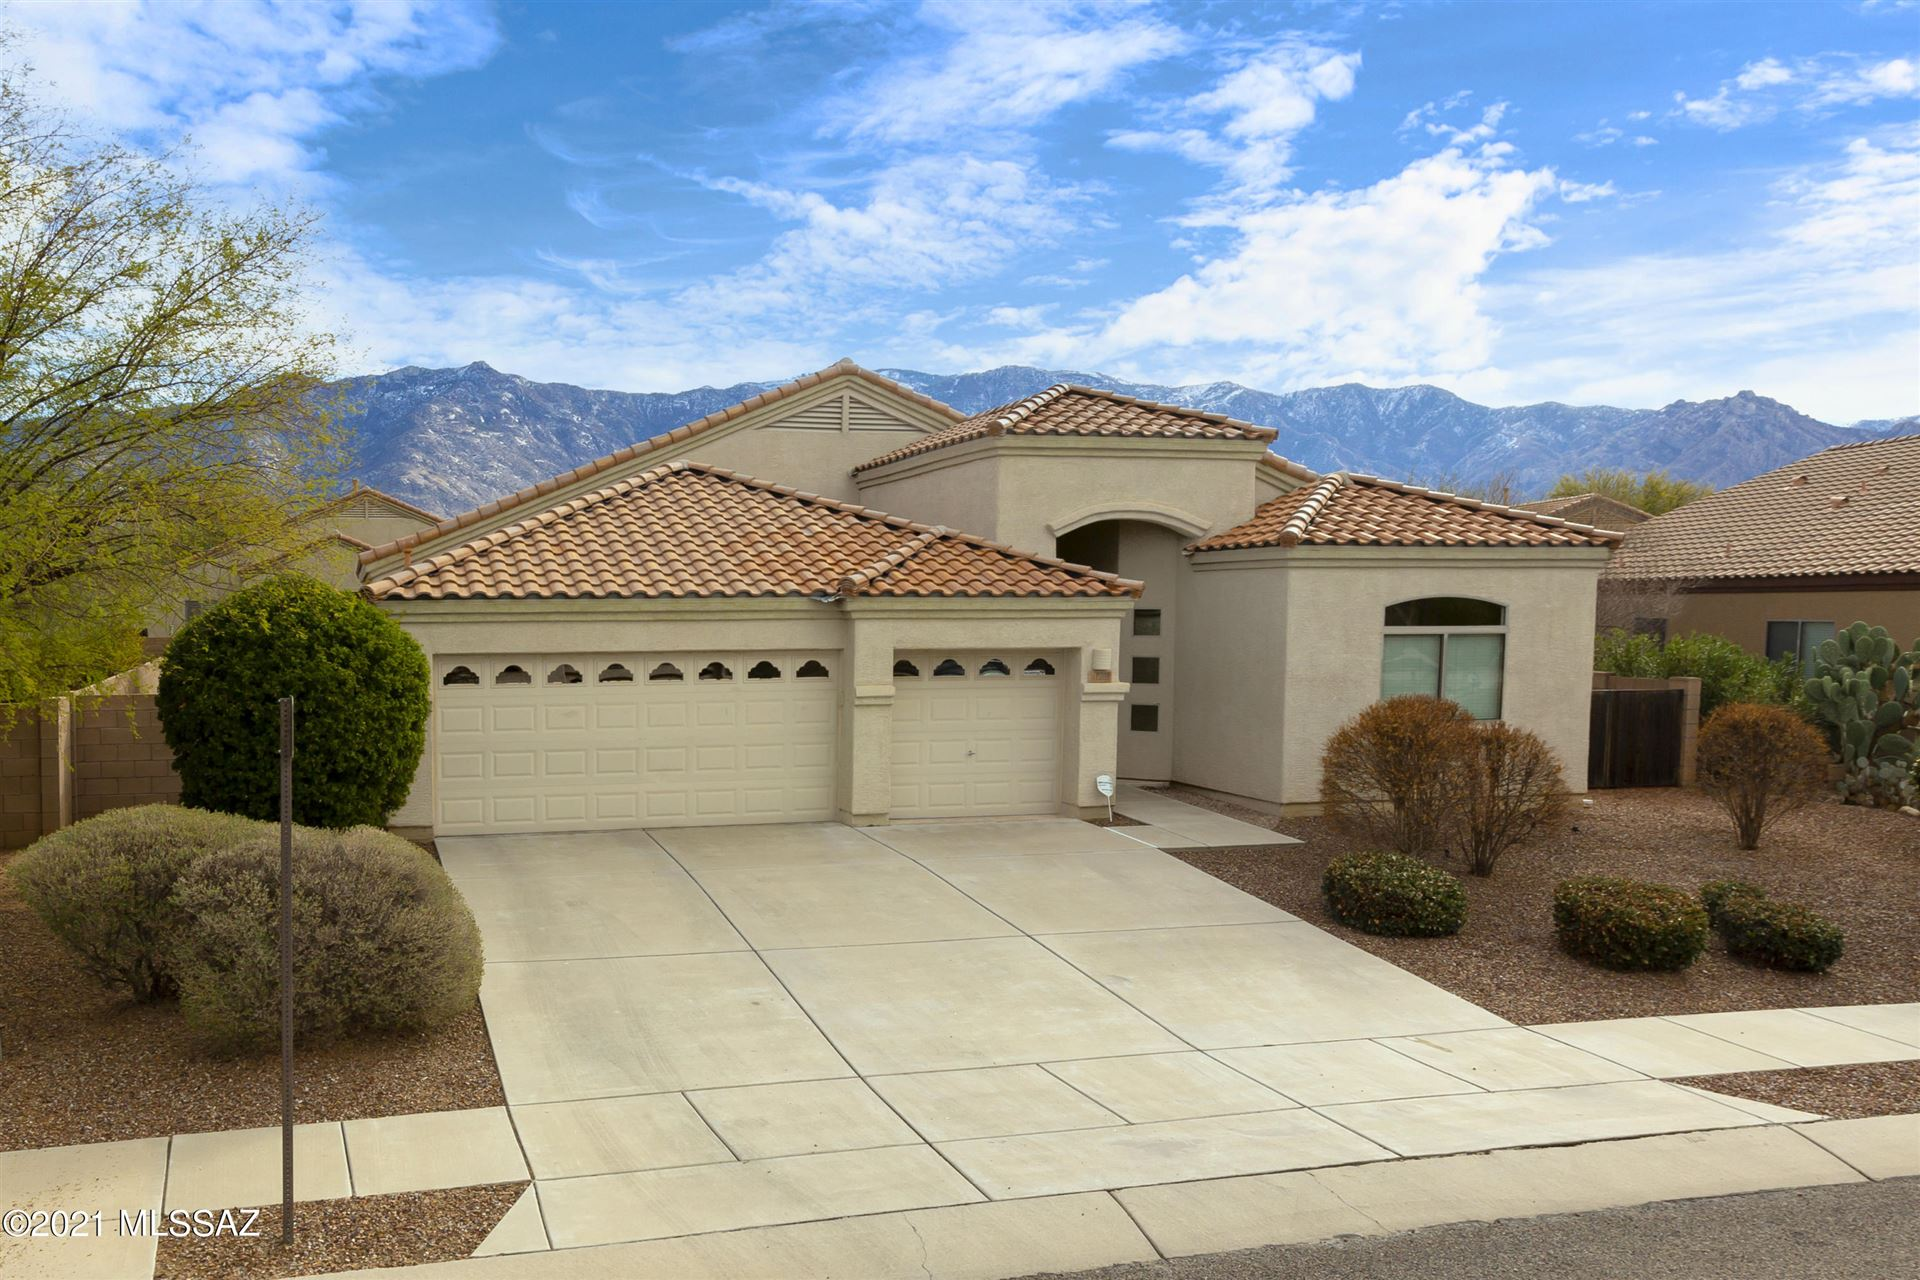 15098 N Pelham Road, Tucson, AZ 85739 - #: 22102940